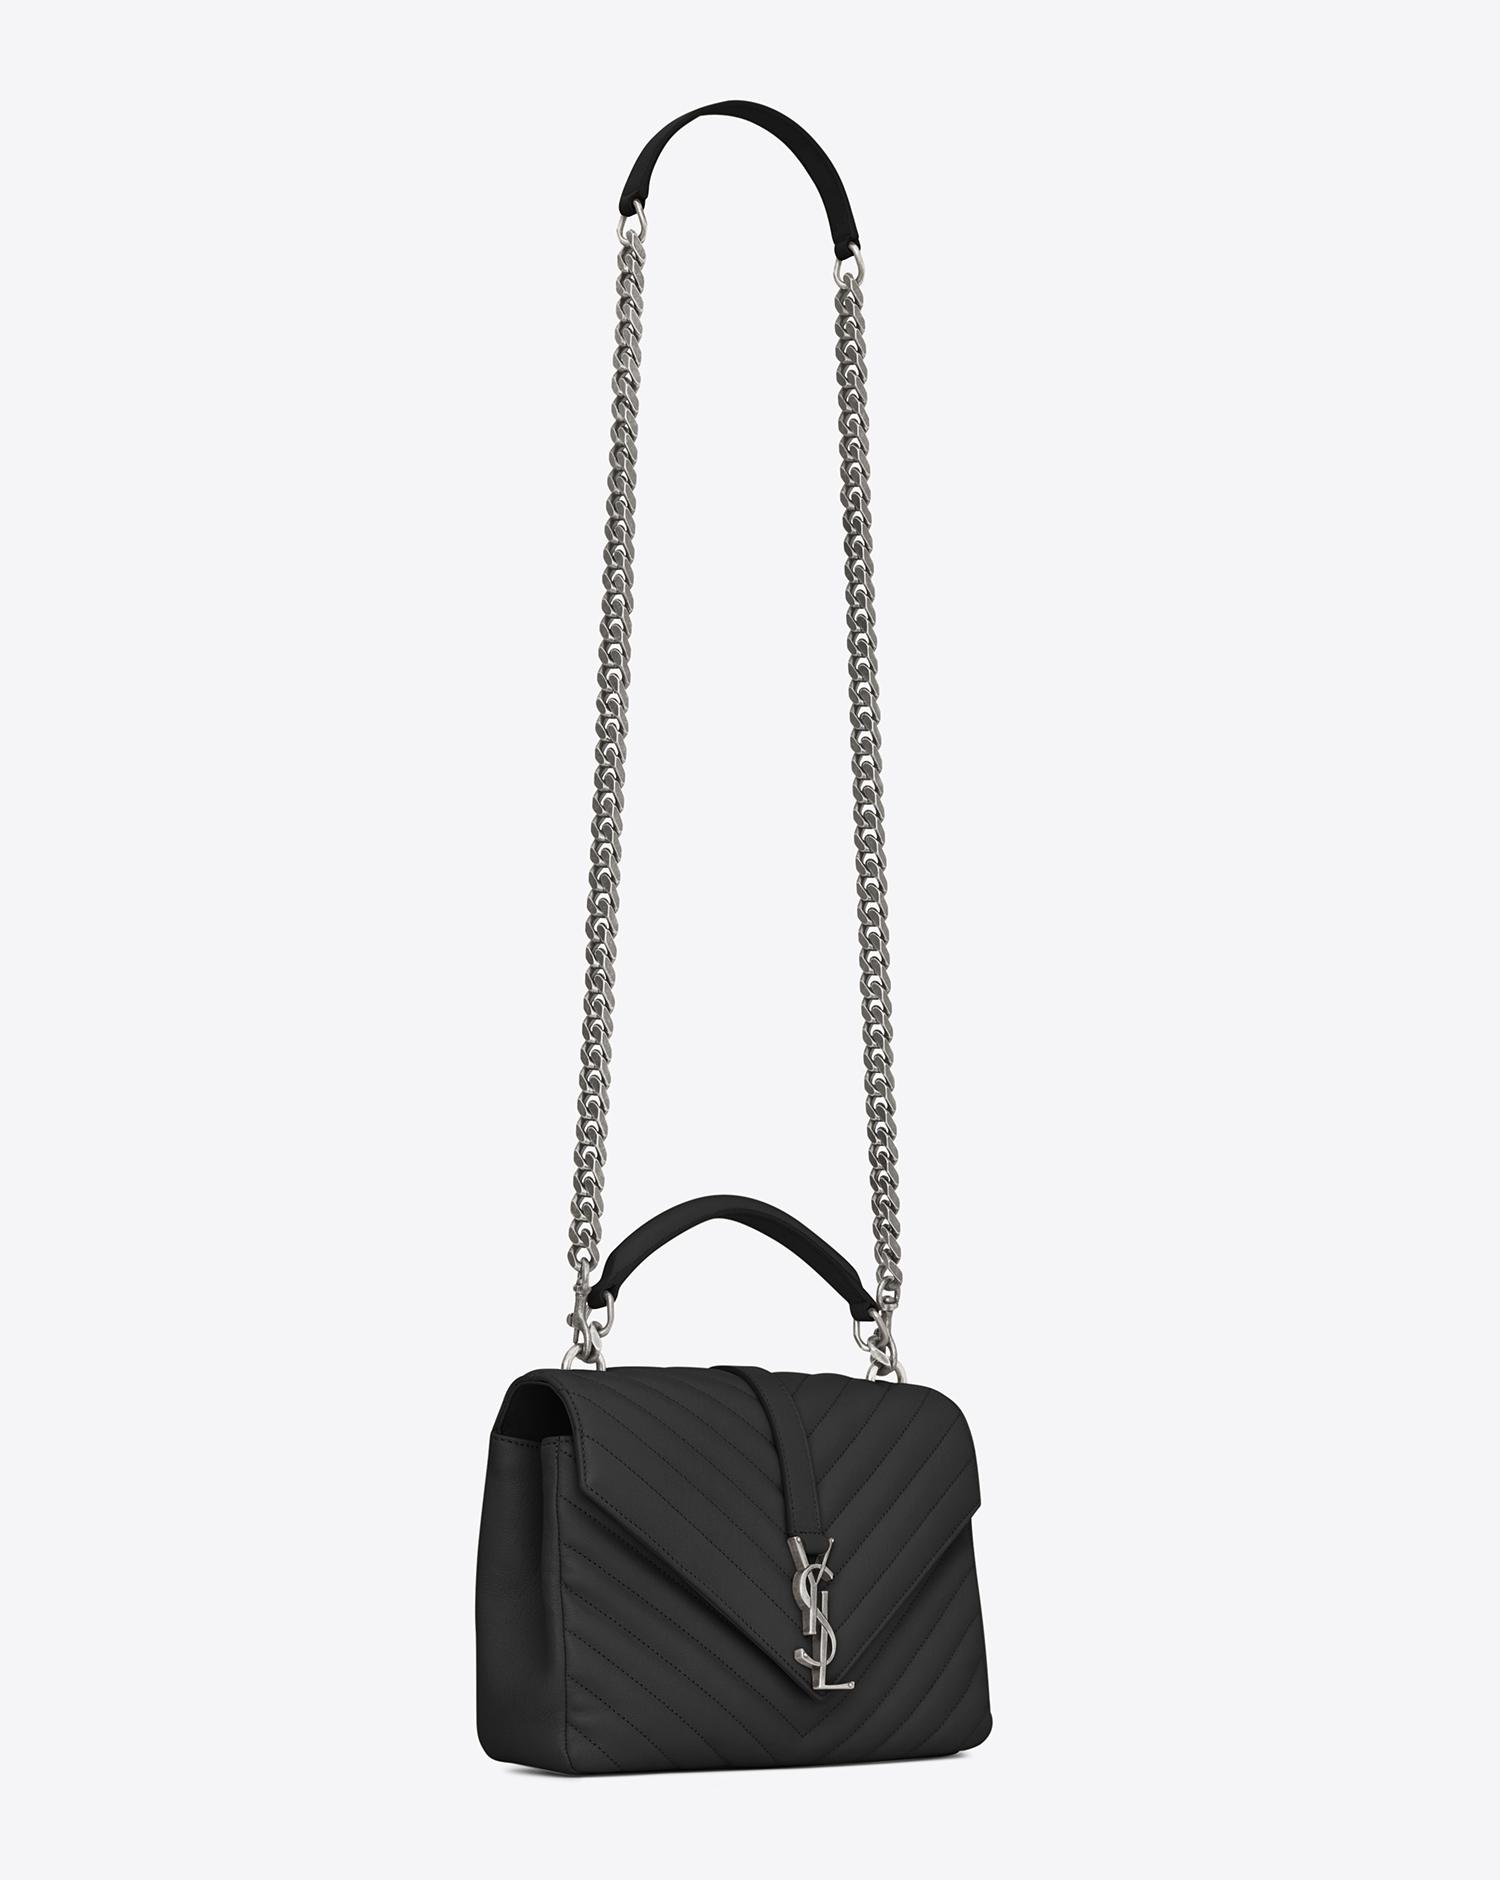 b762d92eda Saint Laurent. Women s Black Monogram College Medium Quilted Leather  Shoulder Bag